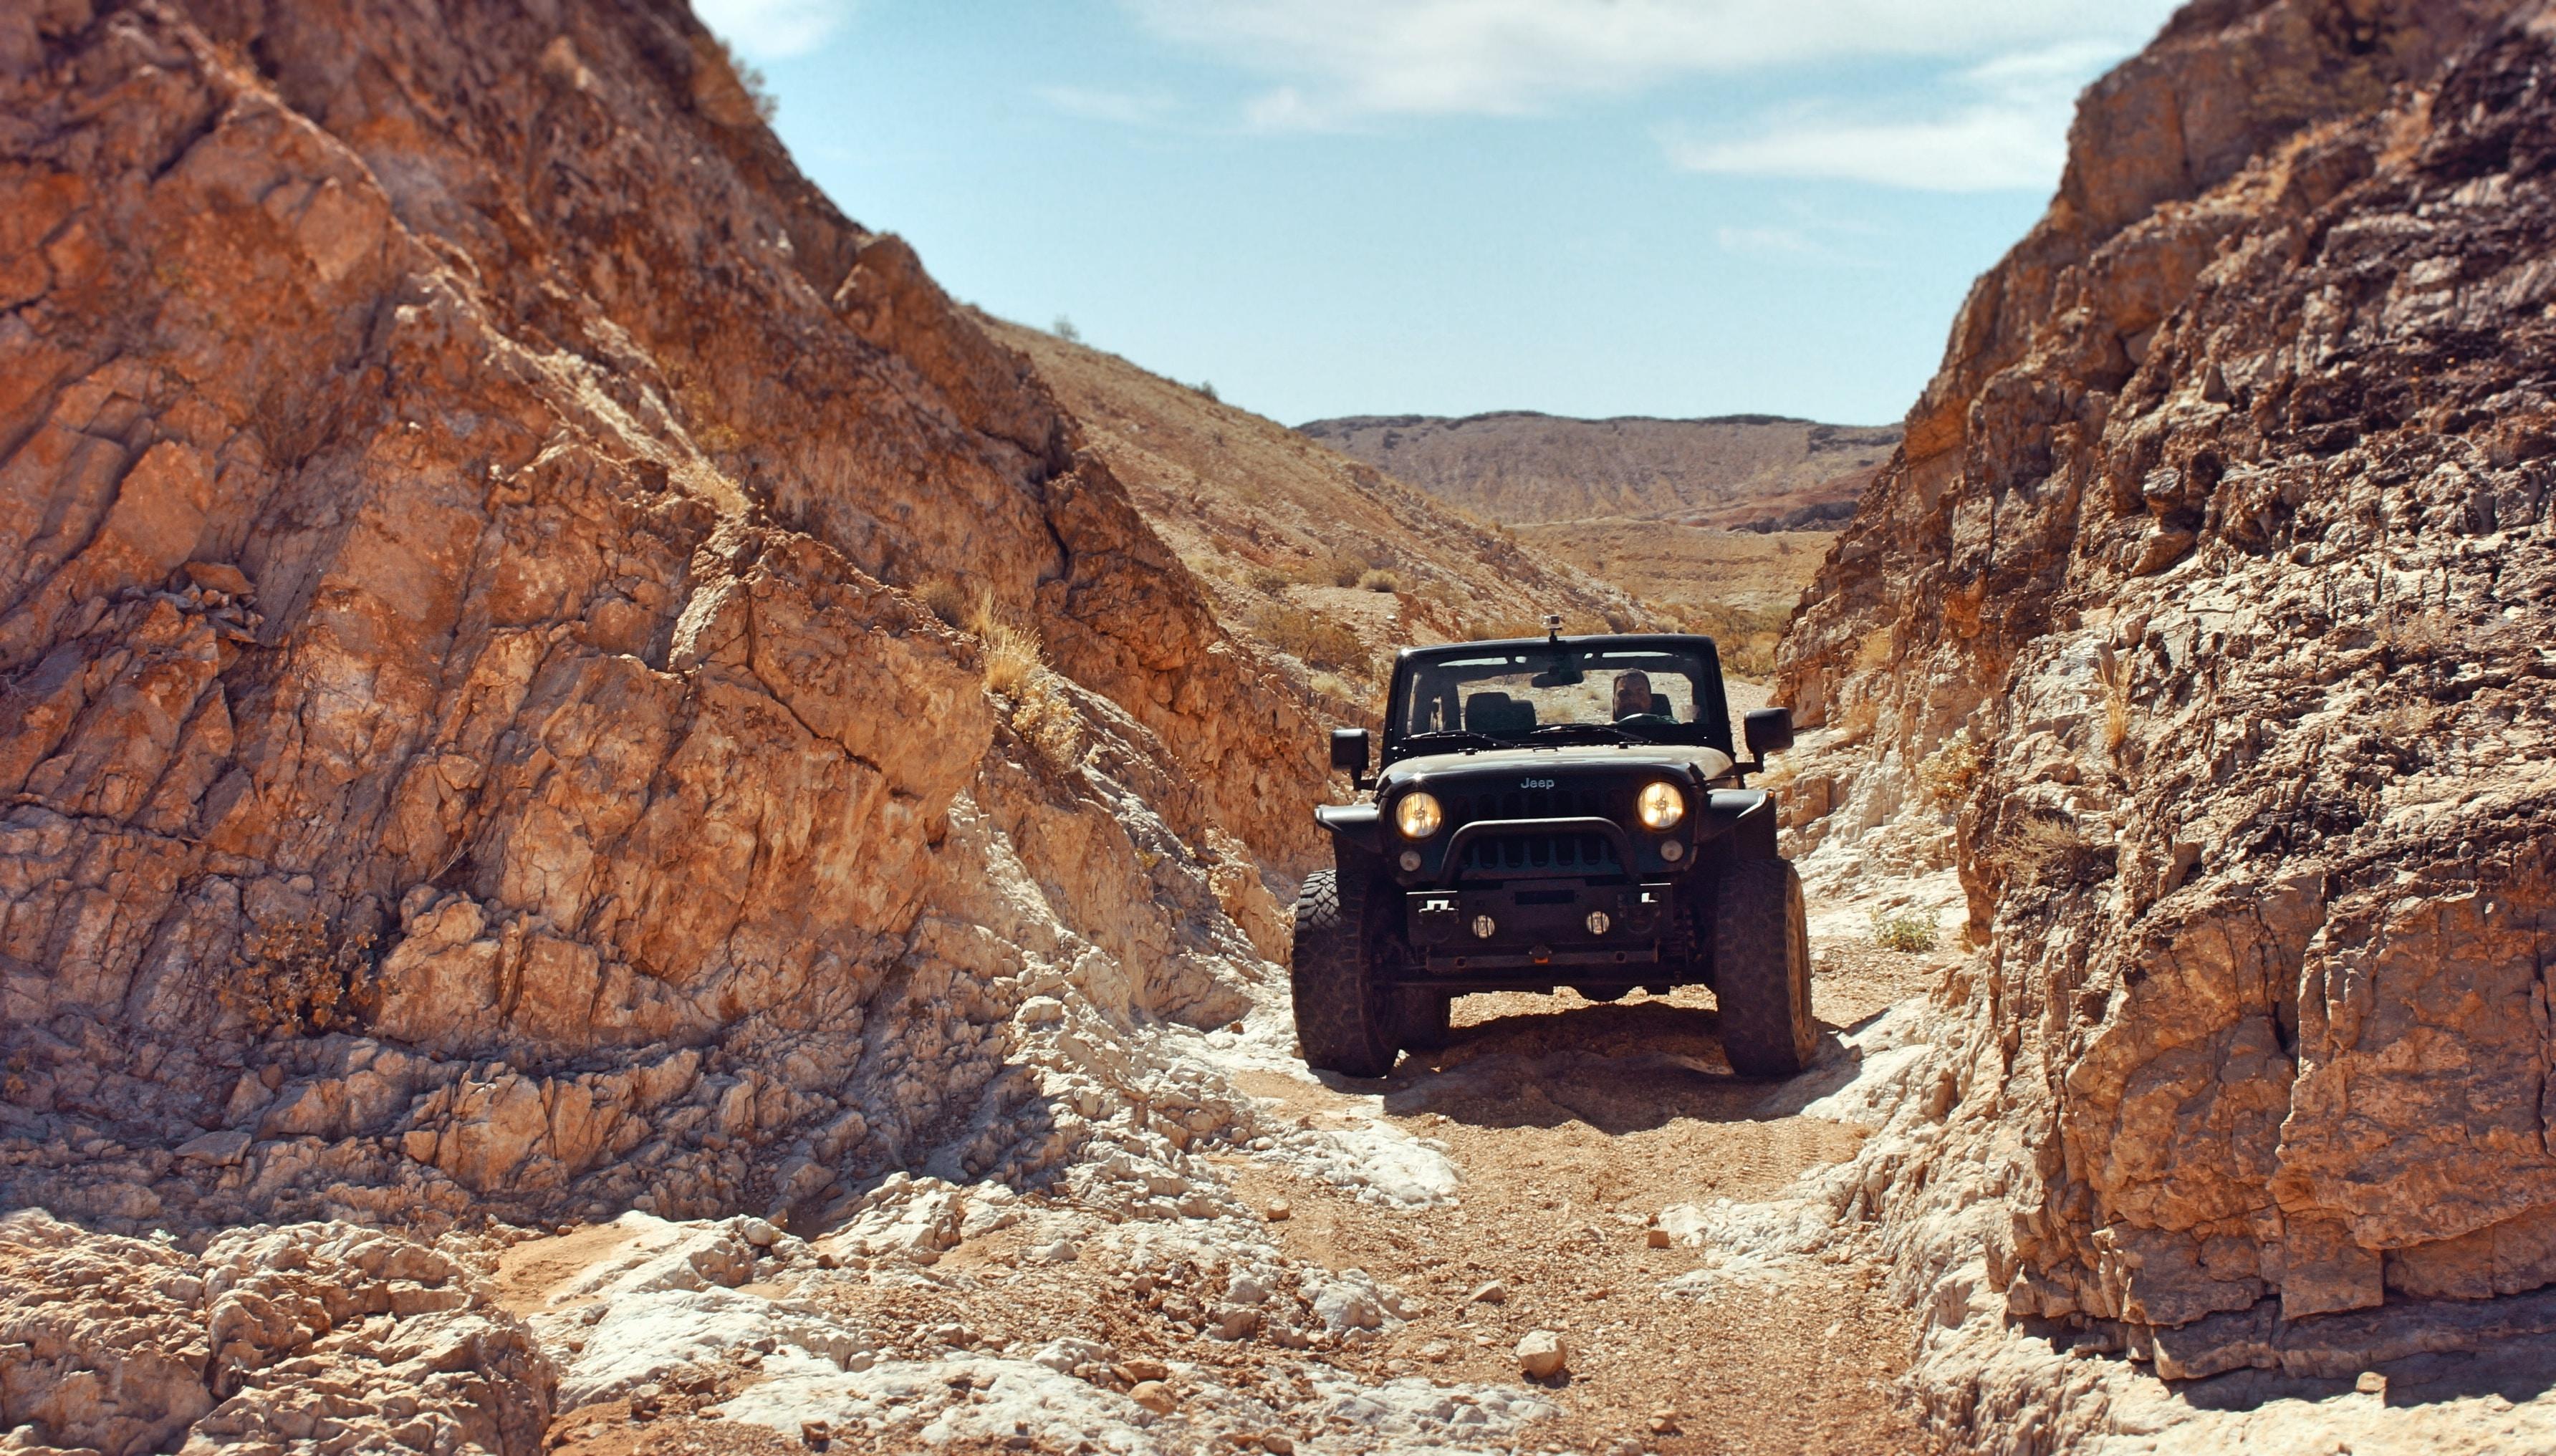 black sport utility vehicle near rock formations